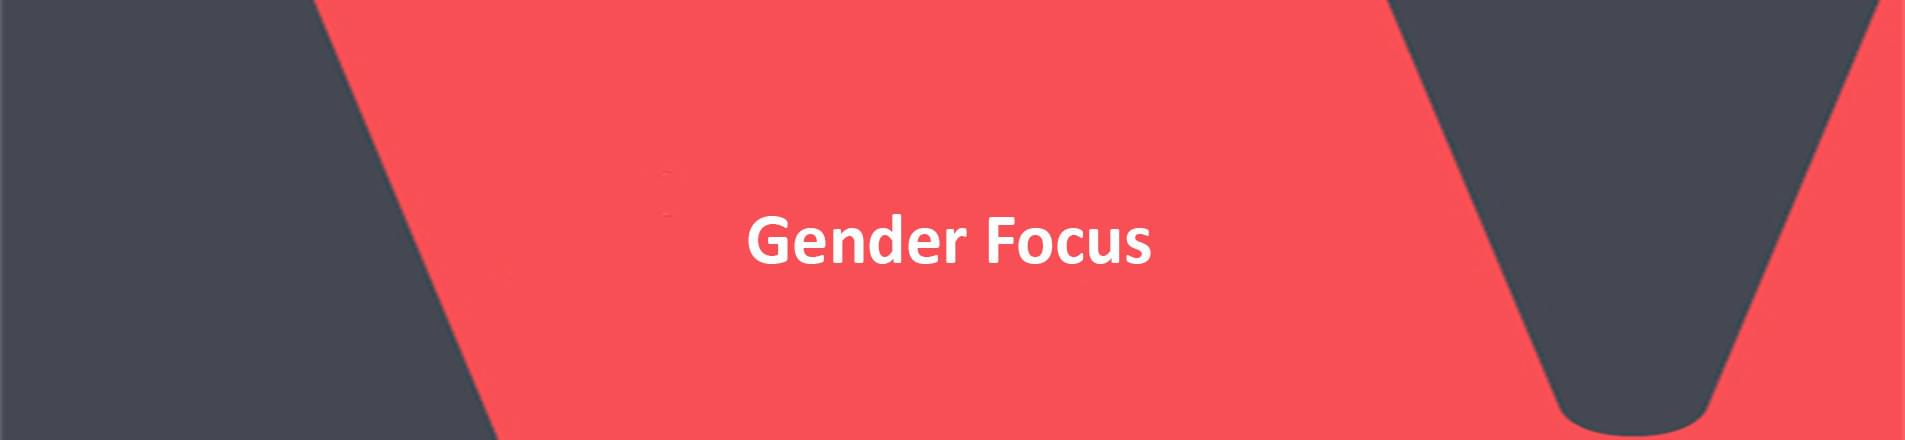 Image of the words gender focus